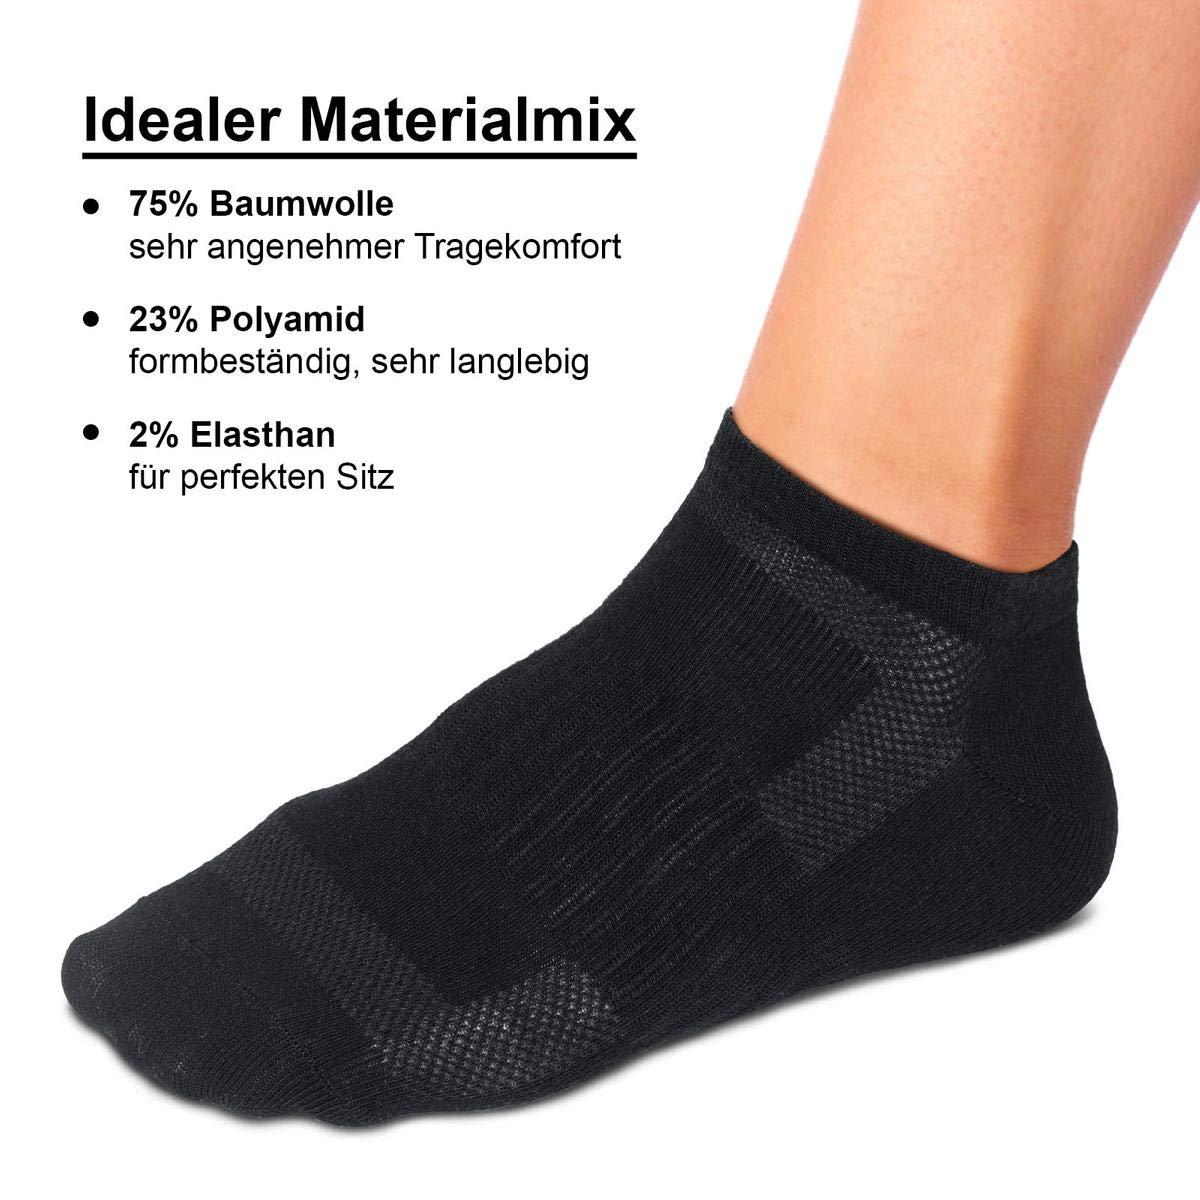 ROYALZ Sneaker Socken 10 Paar für Damen und Herren Füßlinge 10er pack Kurzsocken atmungsaktiv Söckchen leicht bequem